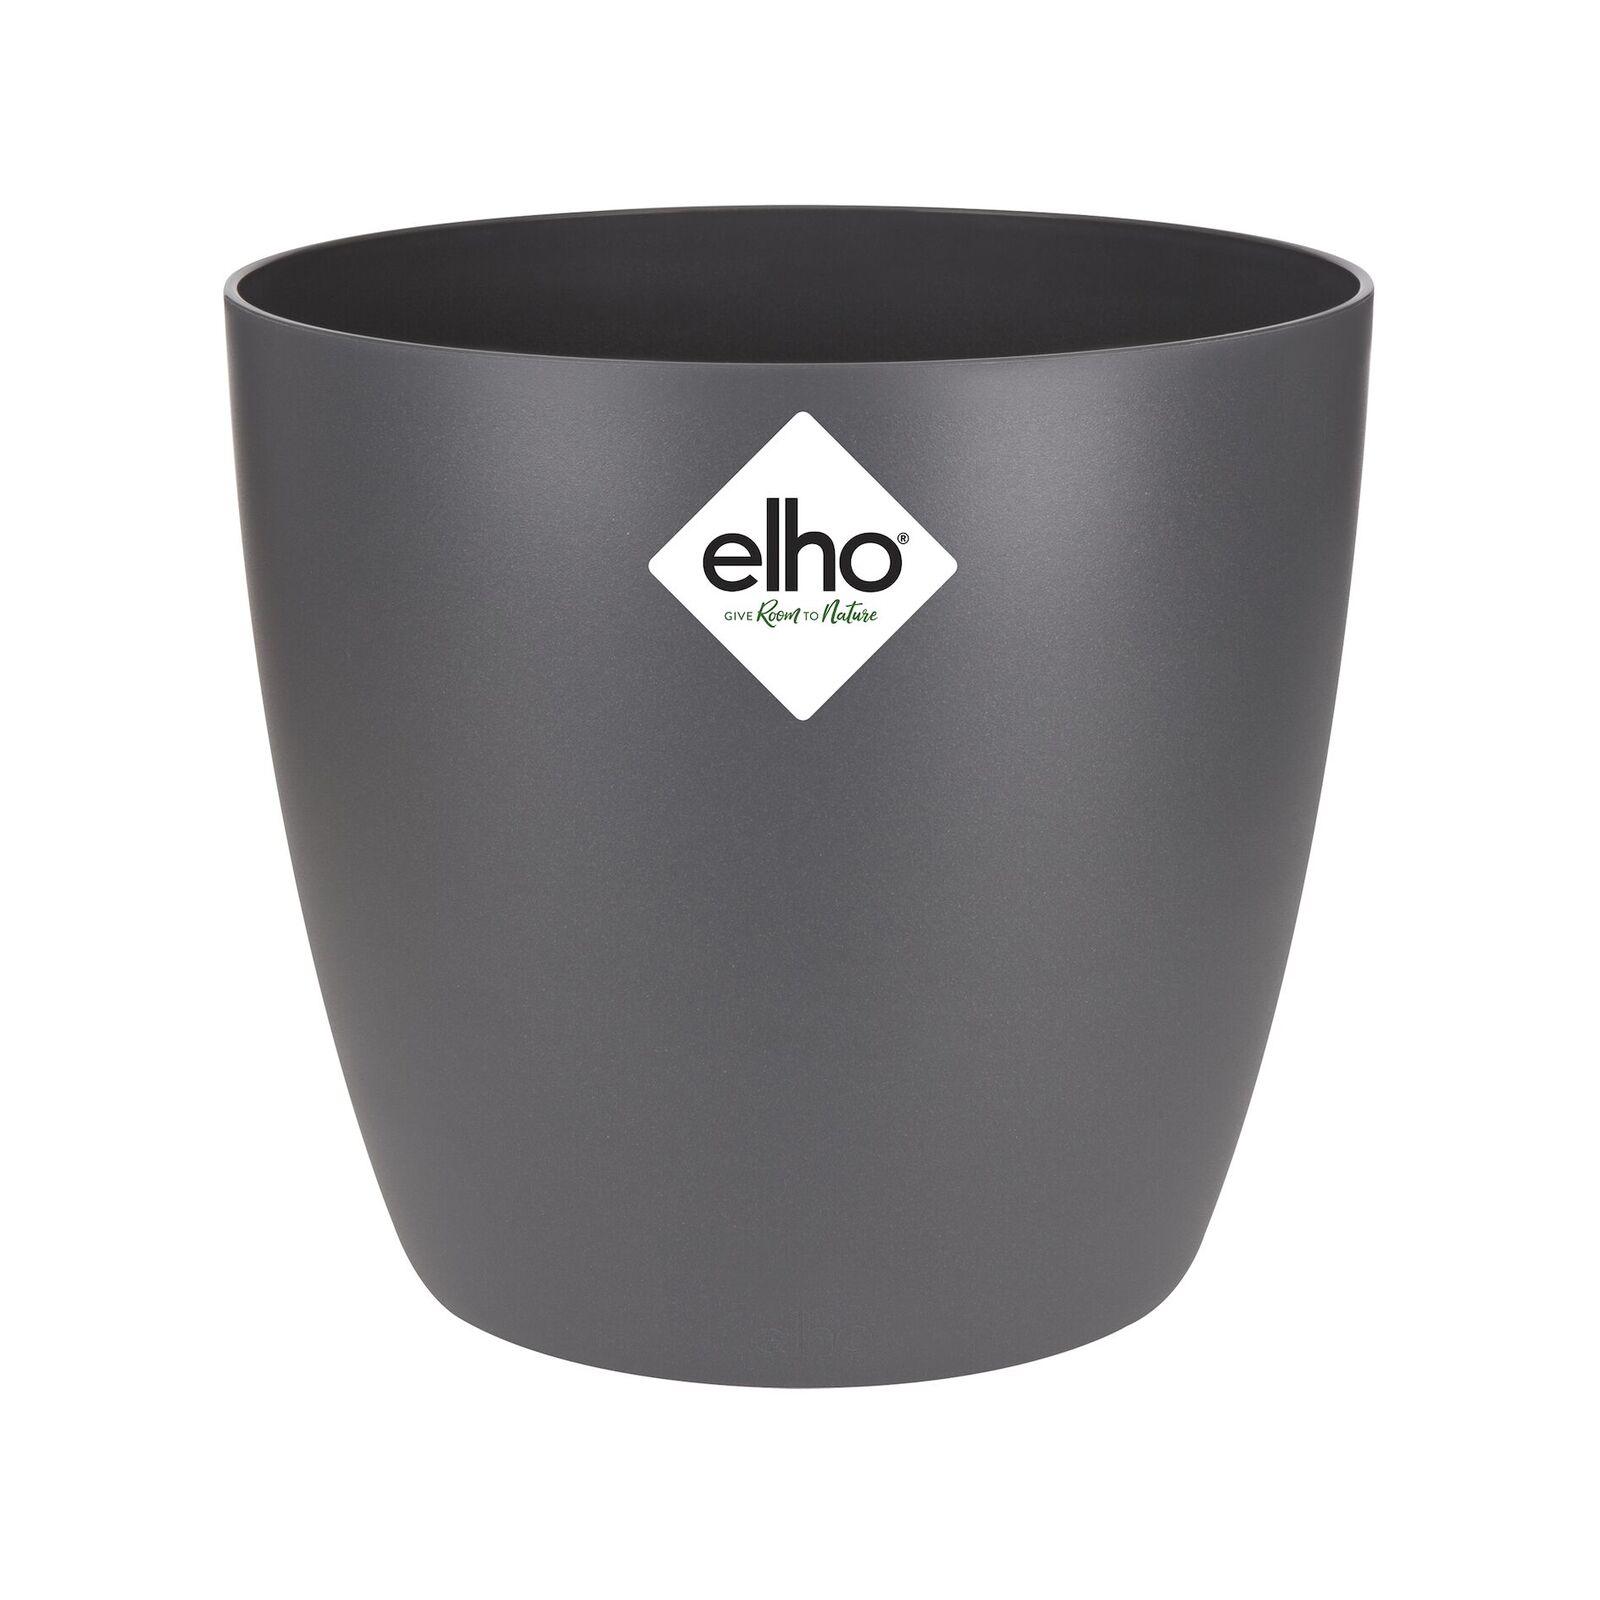 Elho 12.5cm Anthracite Mini Brussels Pot